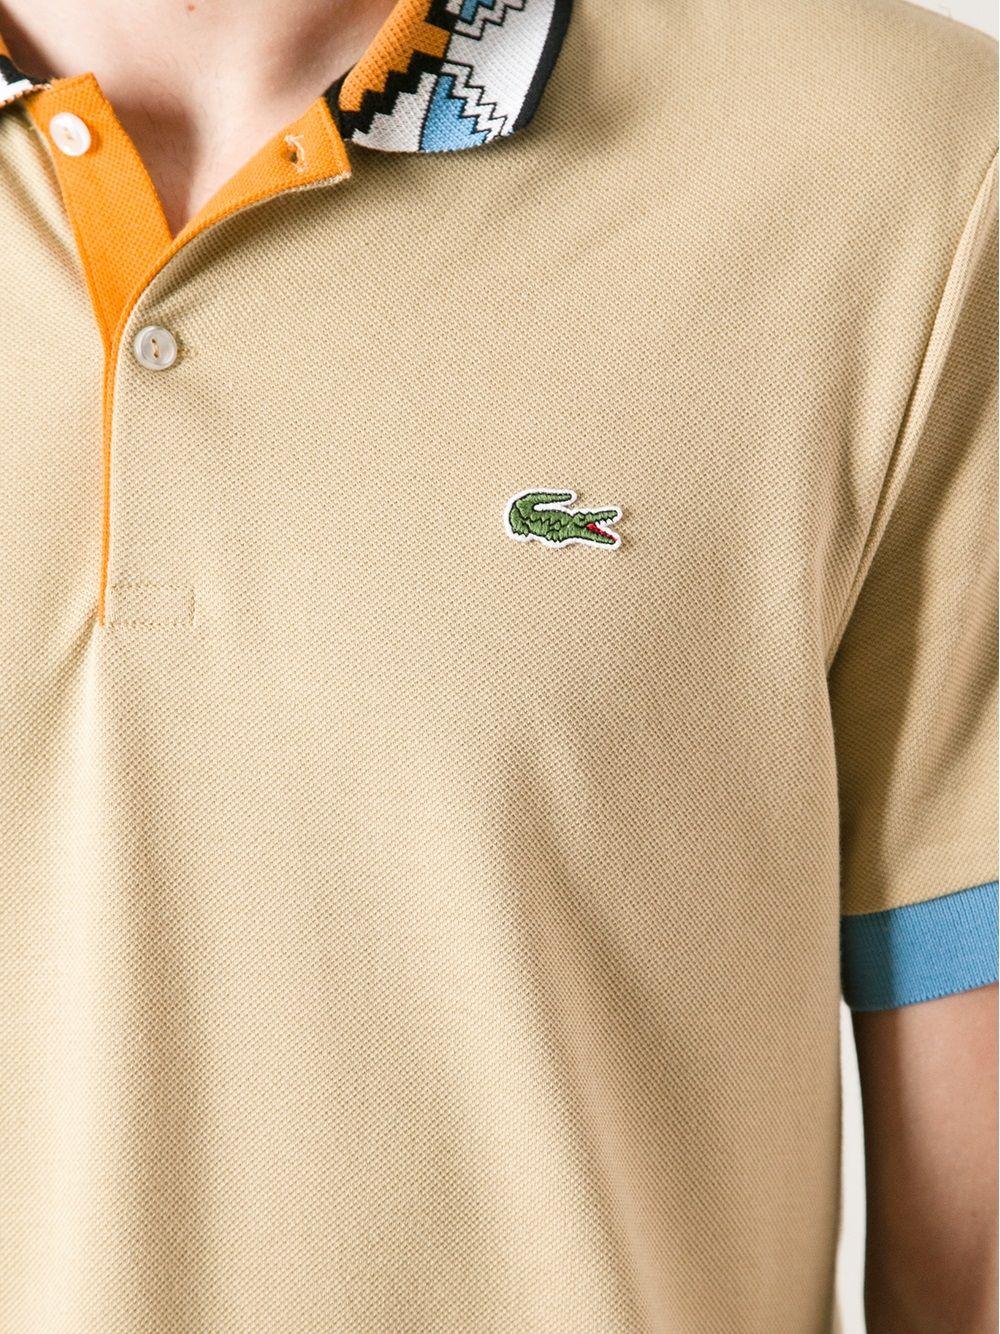 7e16673fd1 Lacoste Live Polo Shirt.   MEN'S STYLE   Polo t shirts, Lacoste polo ...